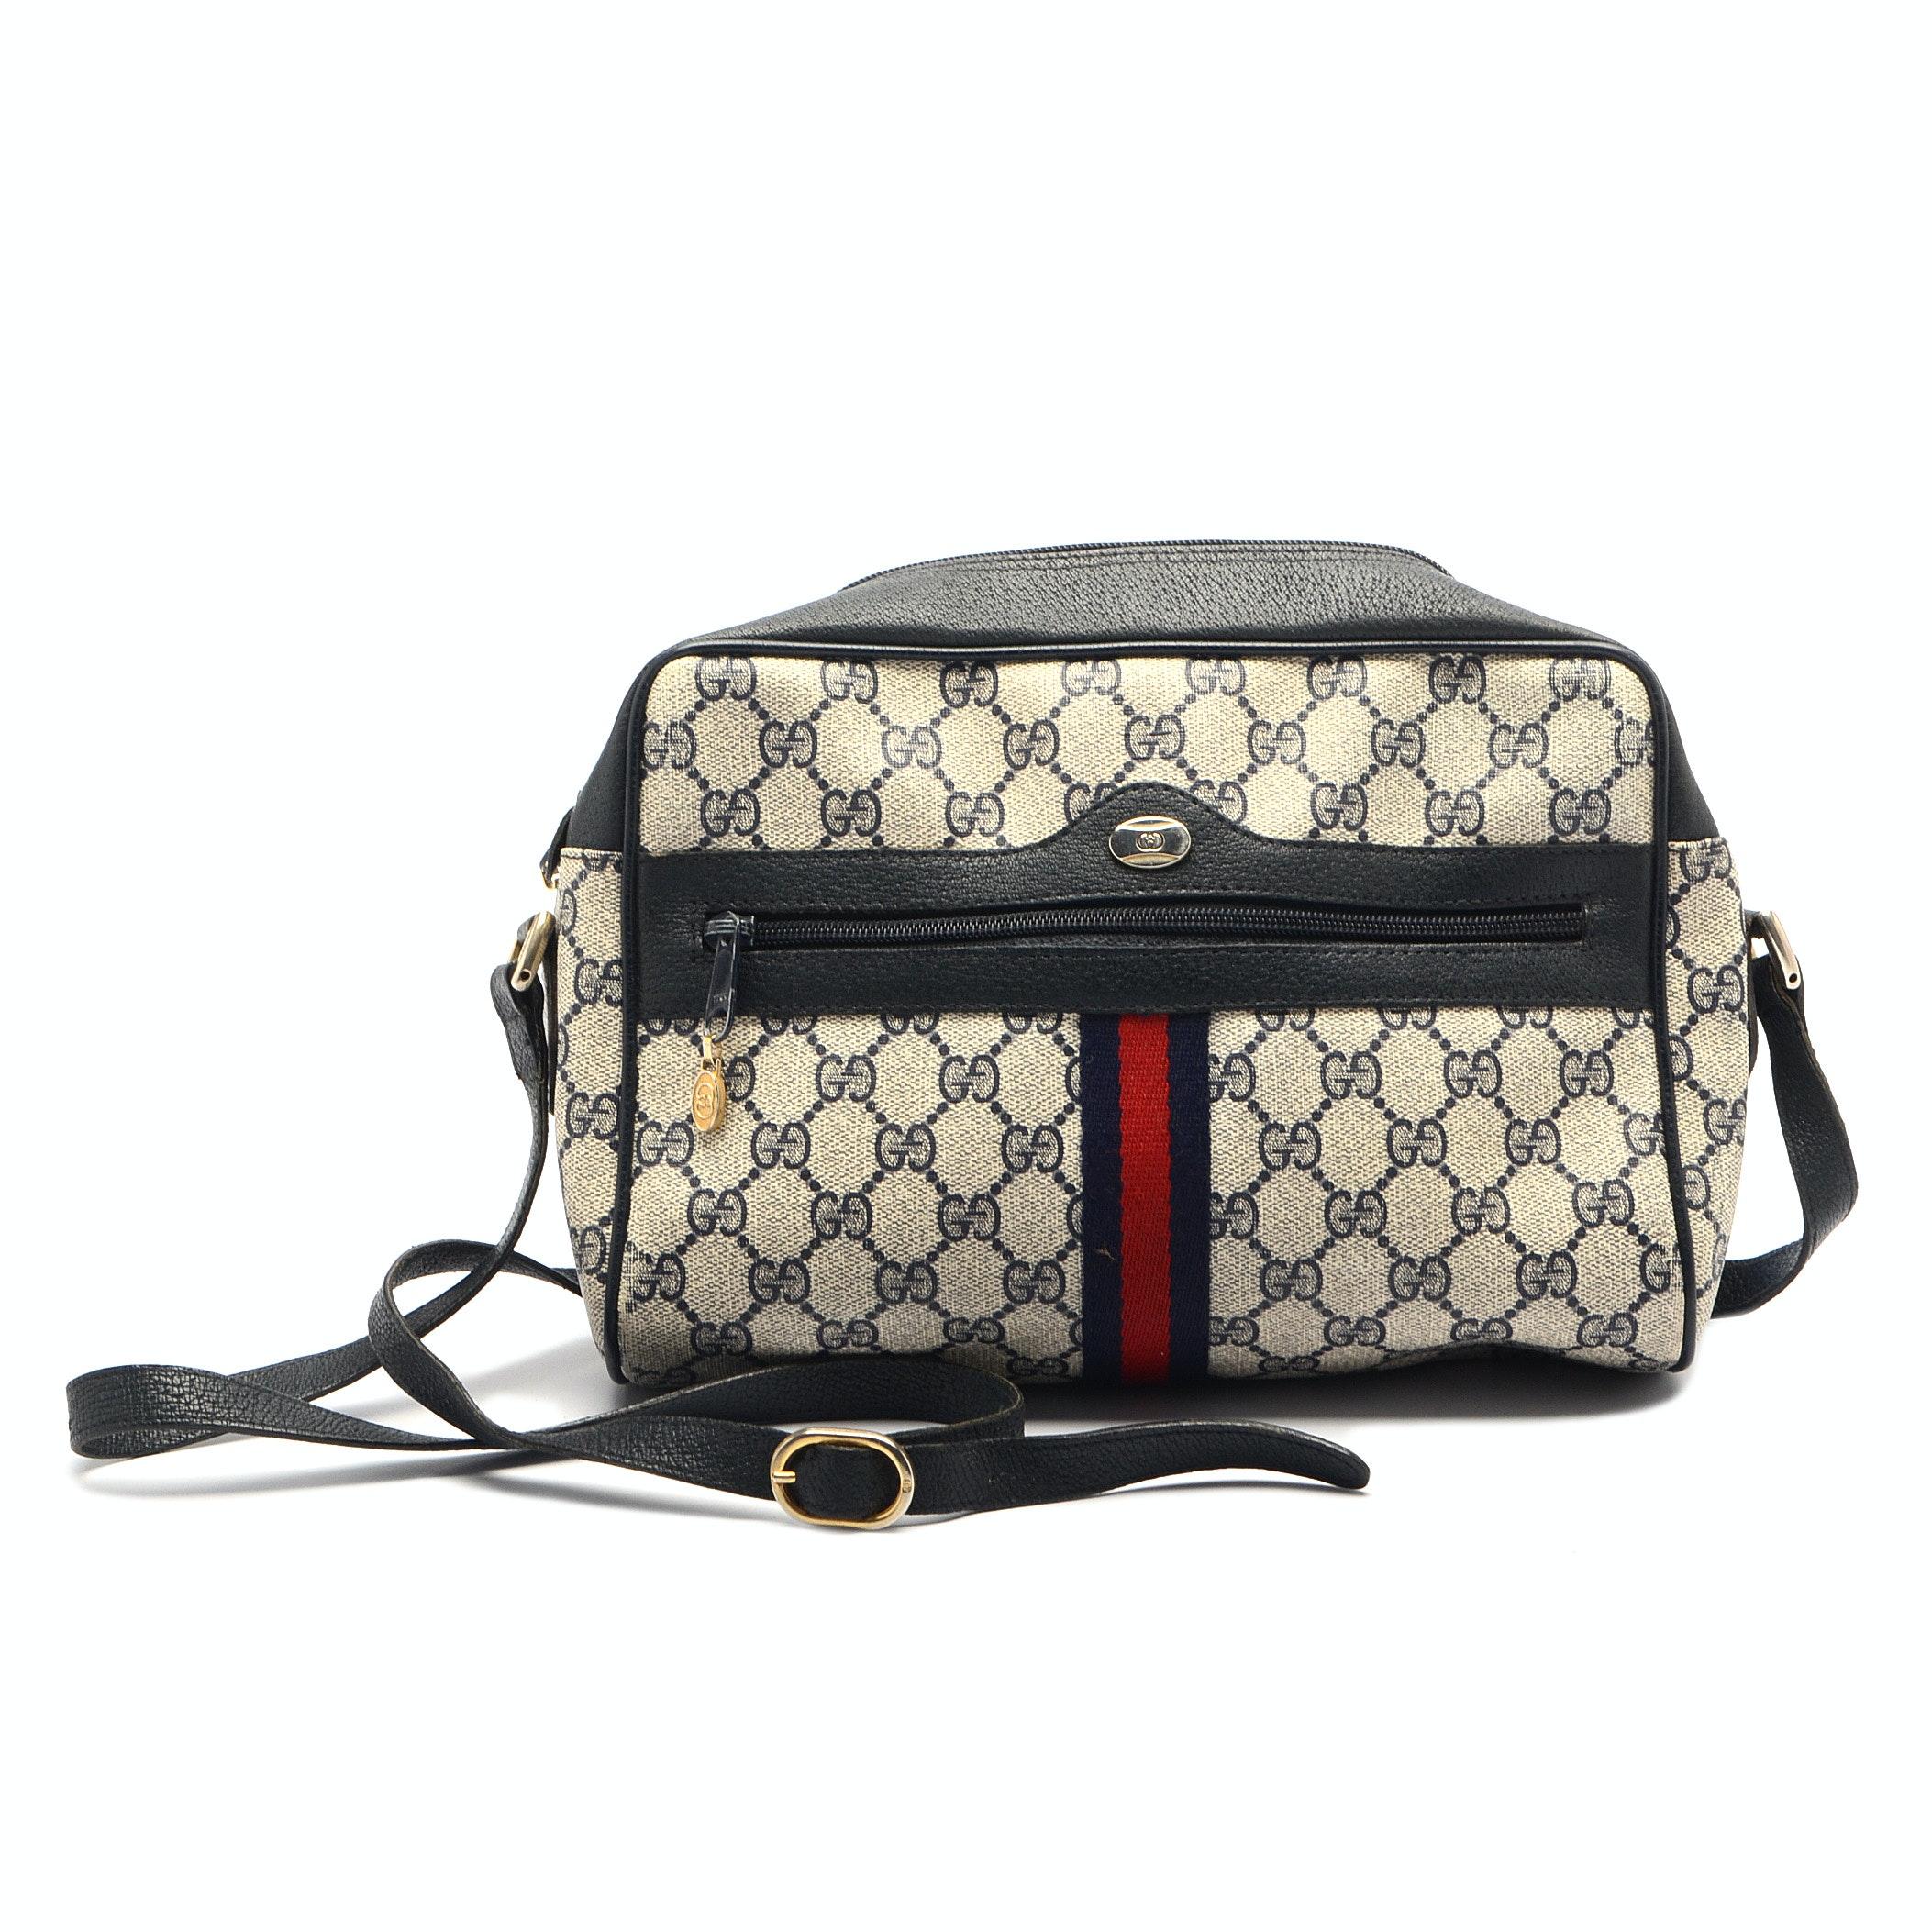 Gucci Accessory Collection Handbag